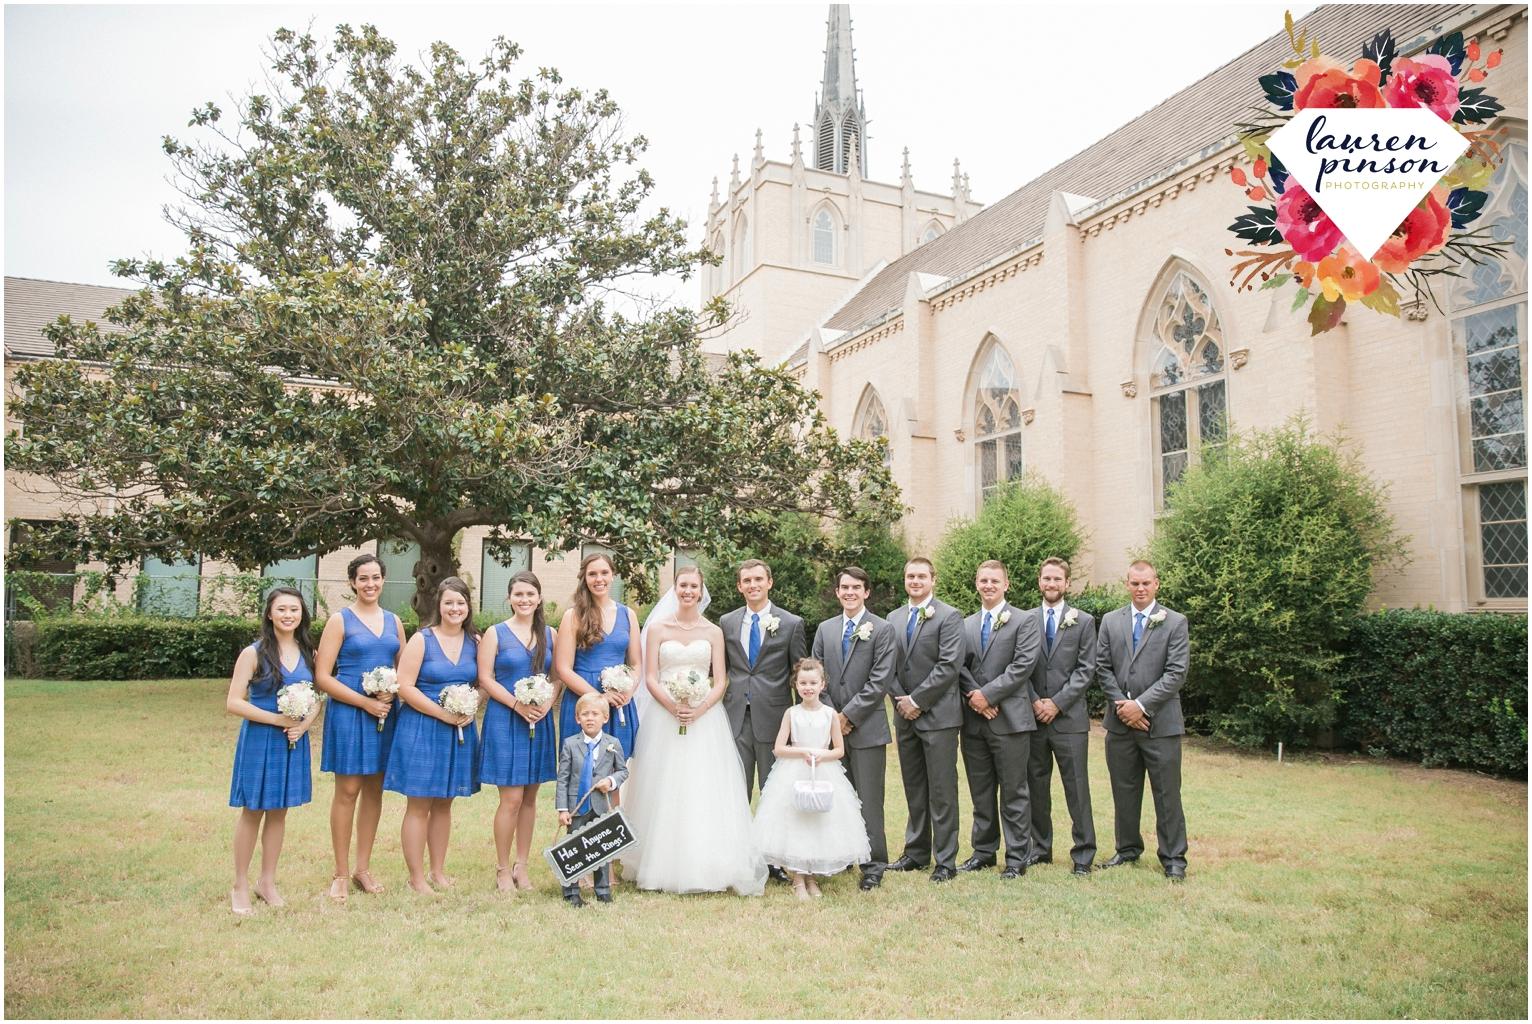 wichita-falls-wedding-photography-at-fain-presbyterian-church-and-the-wellington-timeless-classic-modern-photographer_1160.jpg